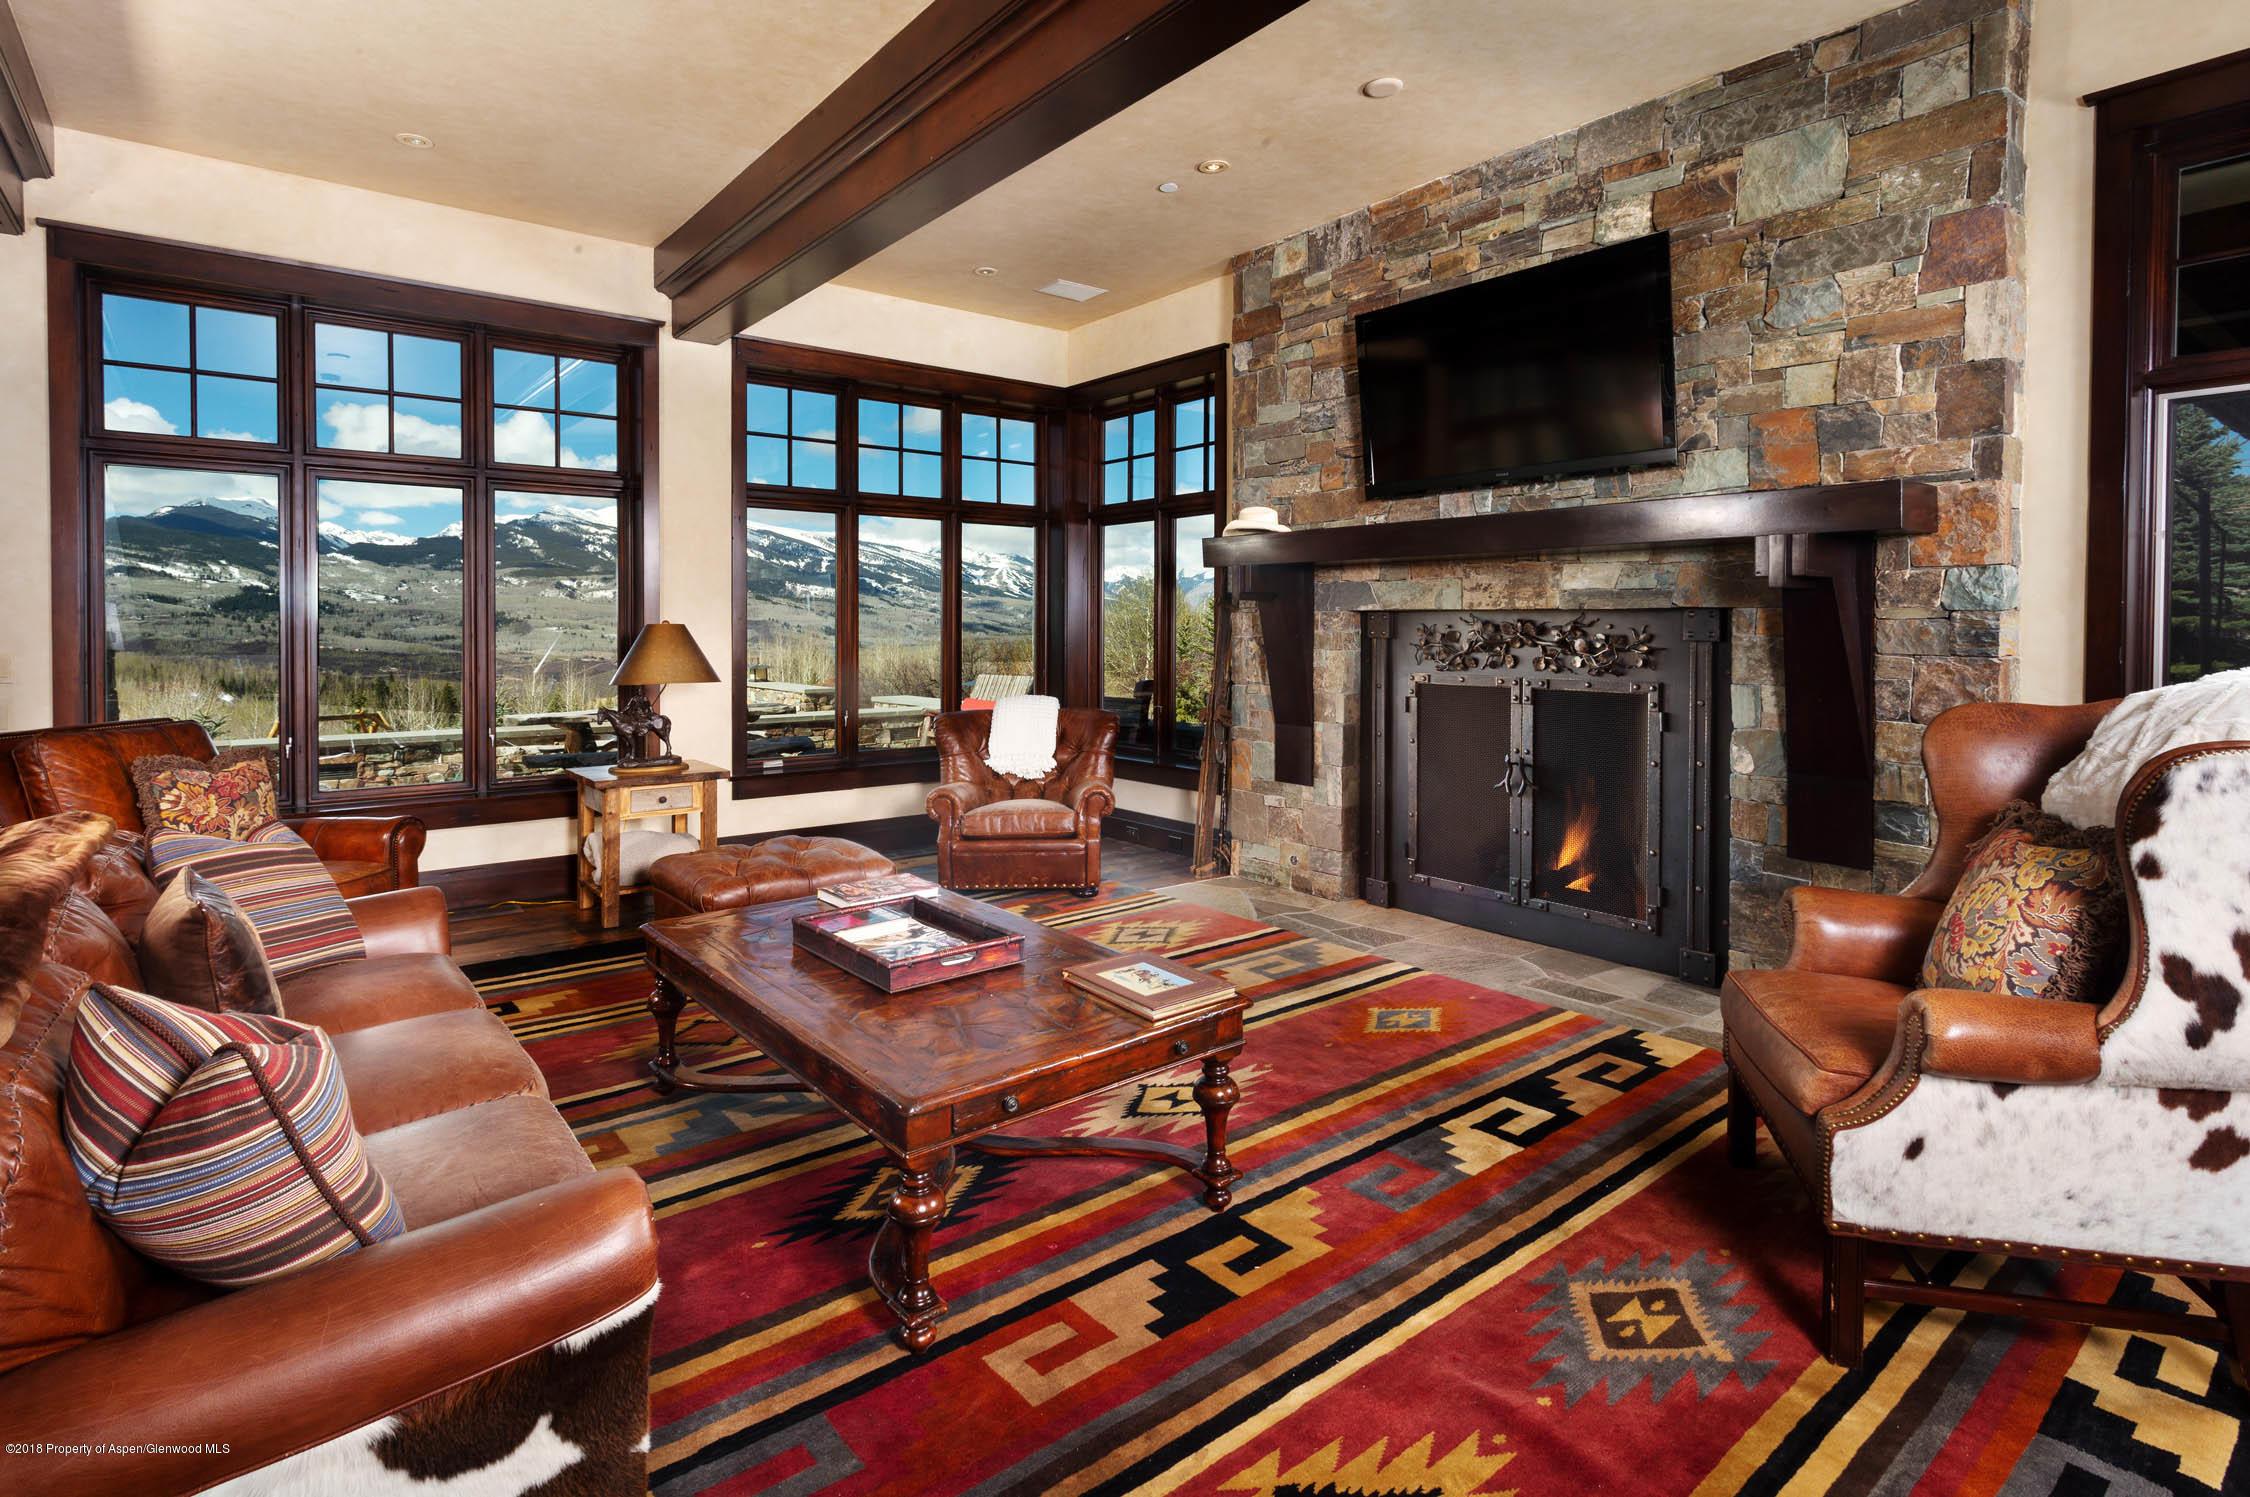 44 Johnson Drive - McLain Flats, Colorado